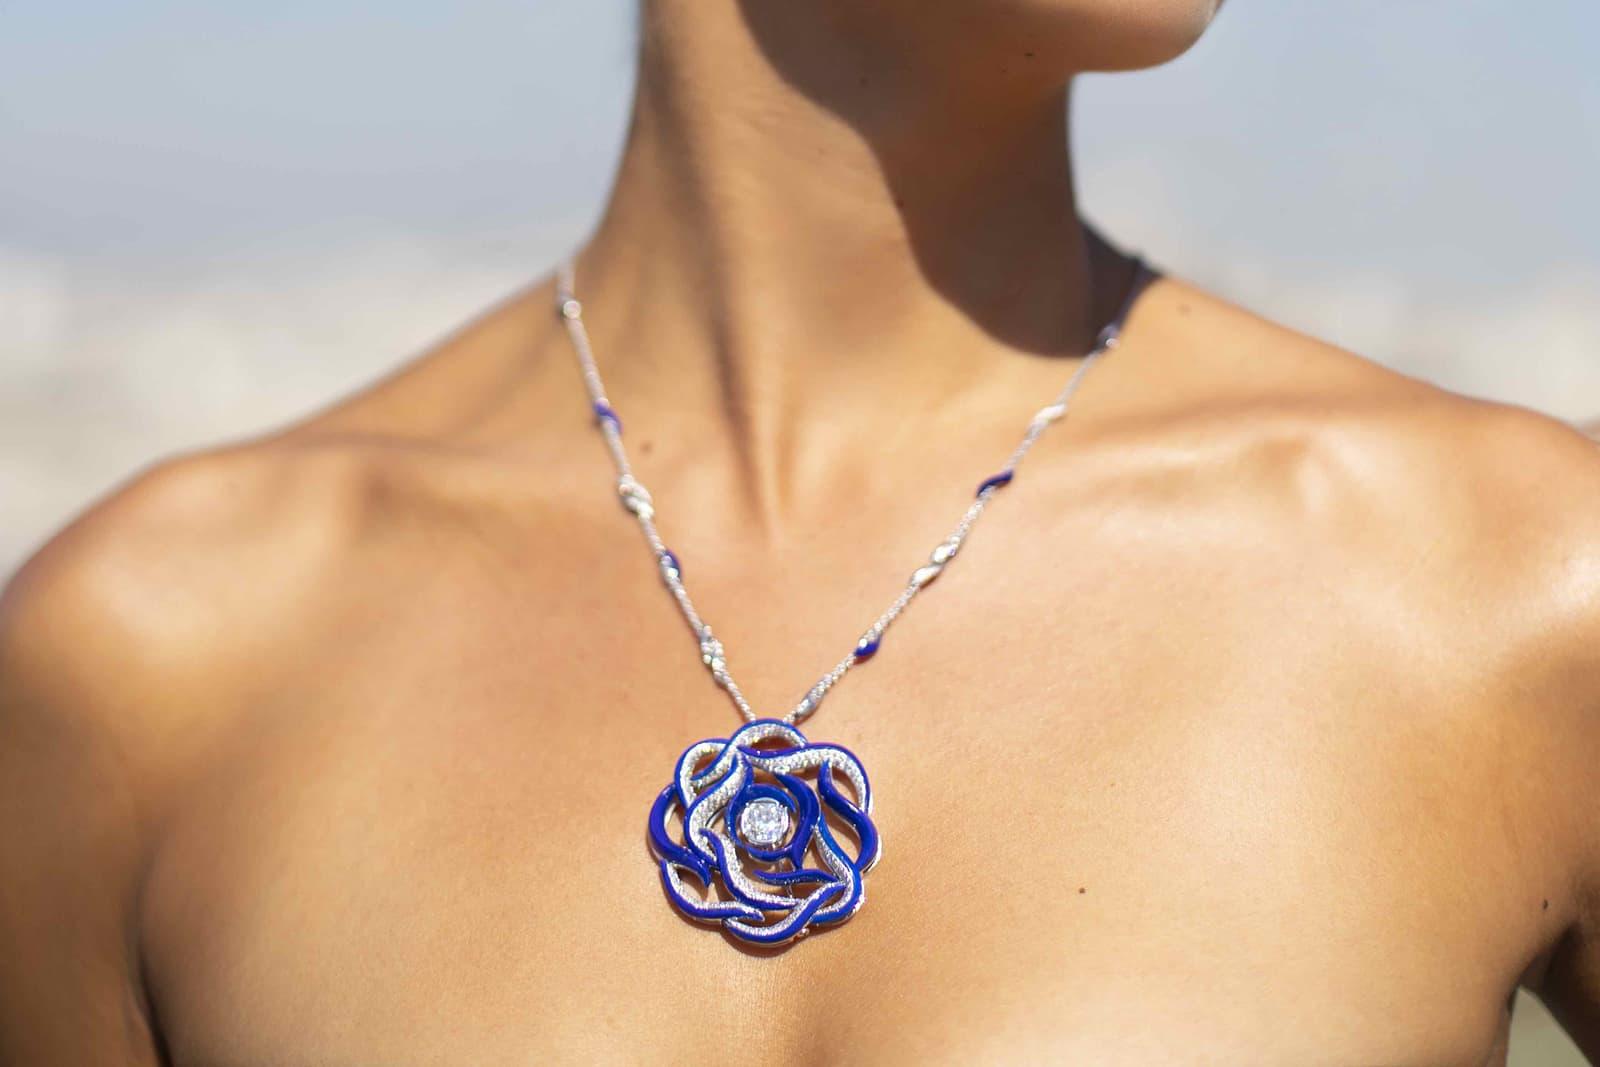 Кулон Mellerio Dits Meller 'Ondine' из коллекции 'Le Ciottoli' с бриллиантами и лазуритом